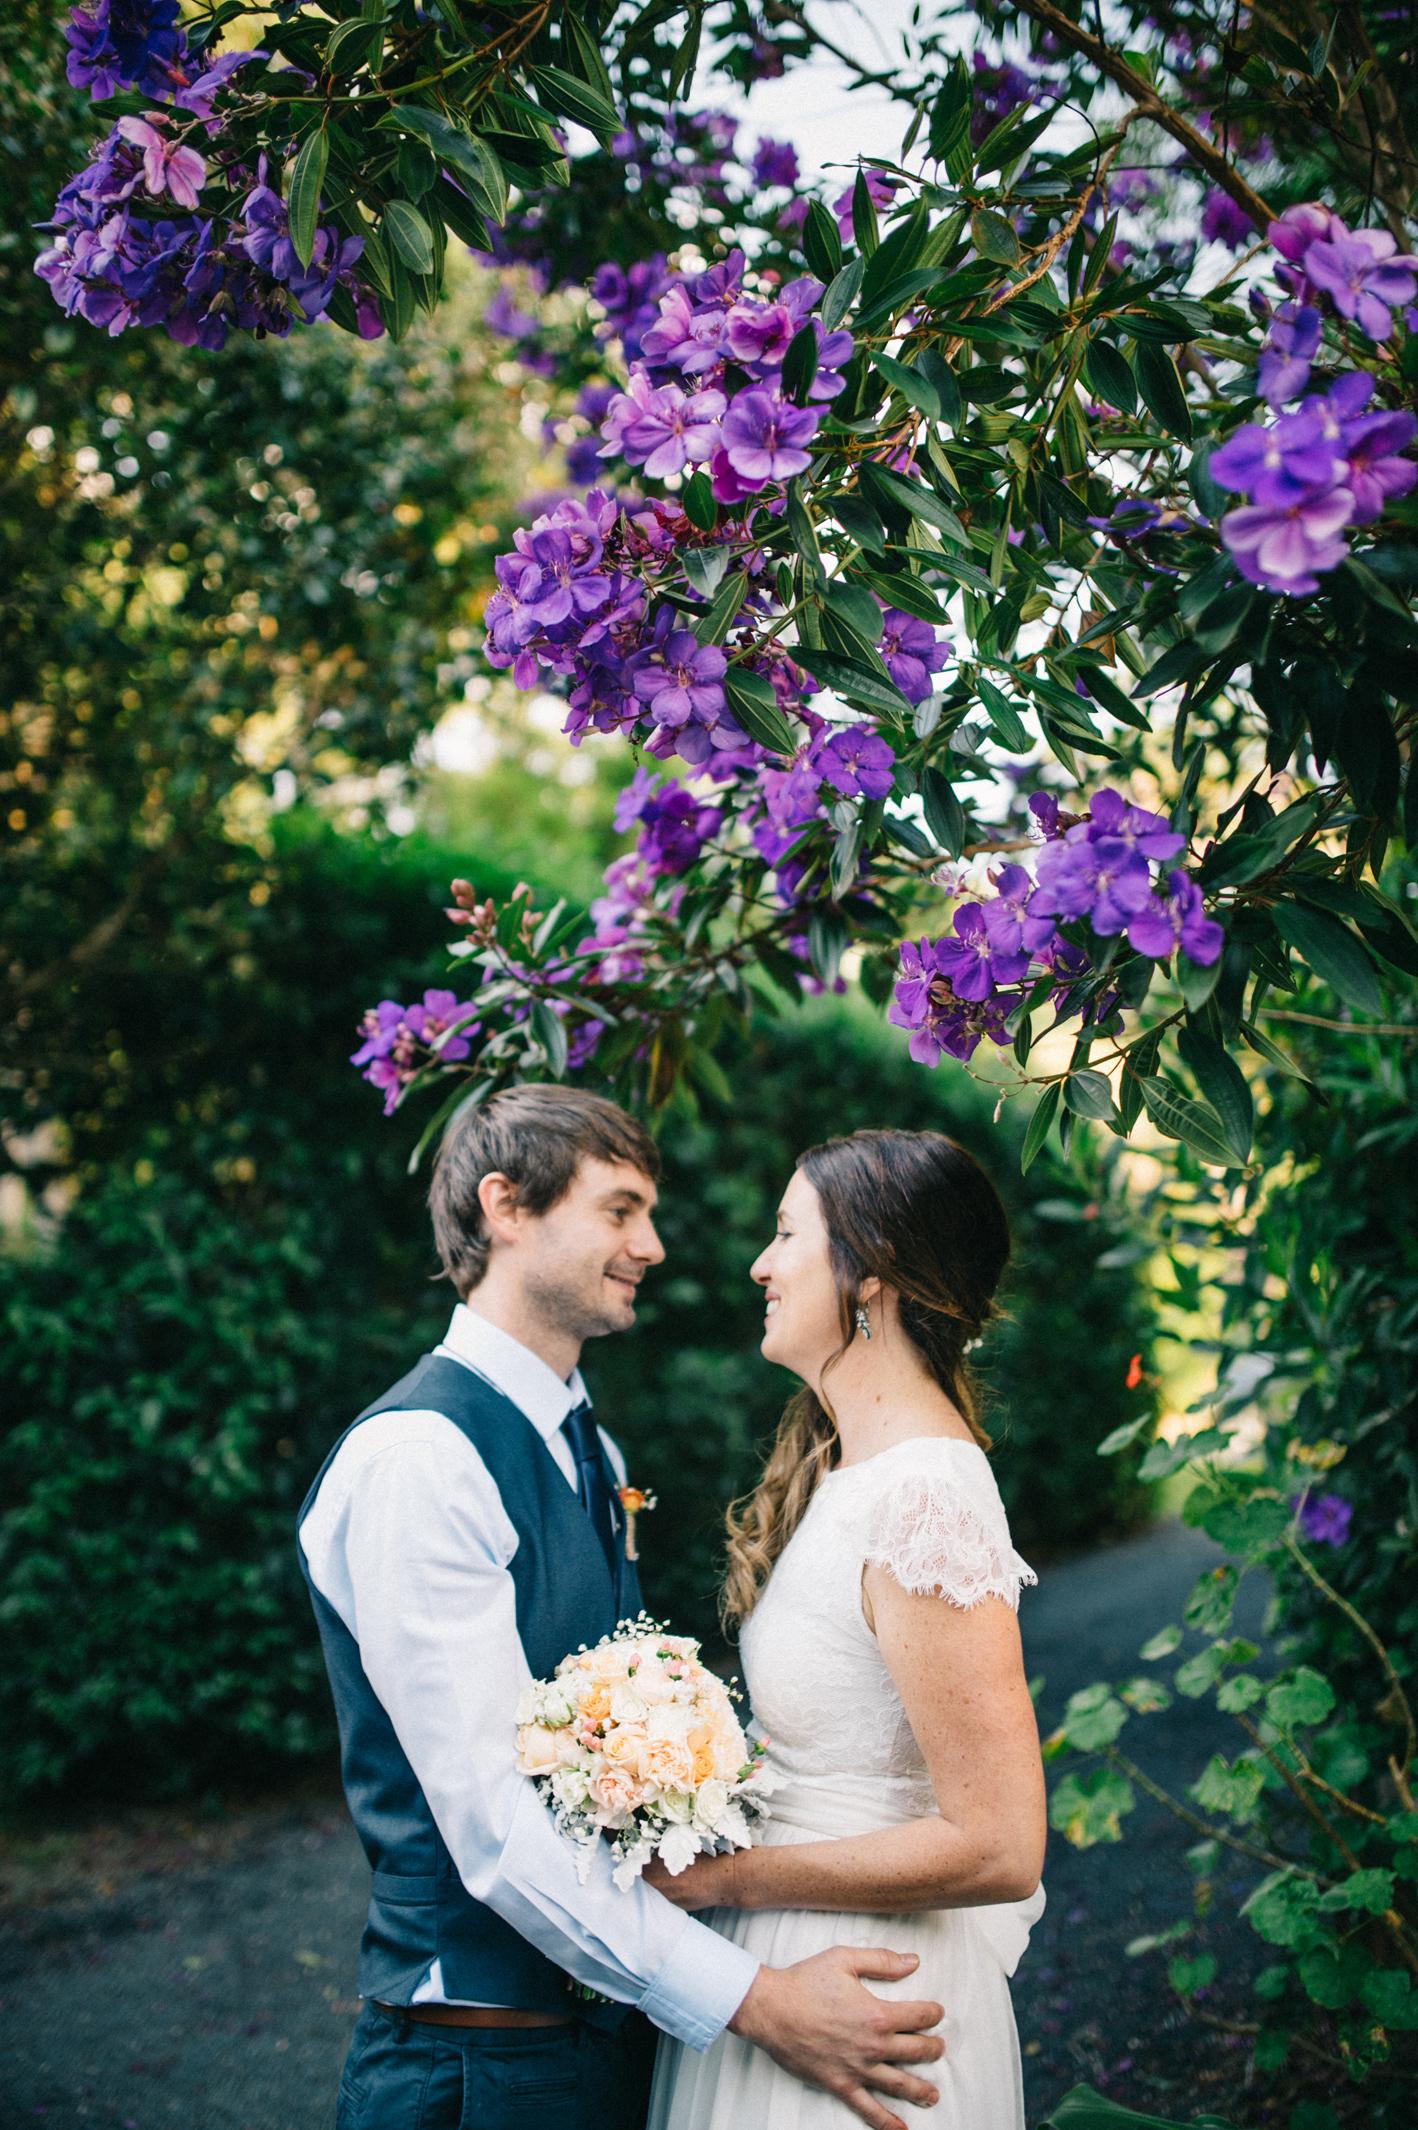 046-michelle-reagan-mount-tamborine-wedding-sophie-baker-photography